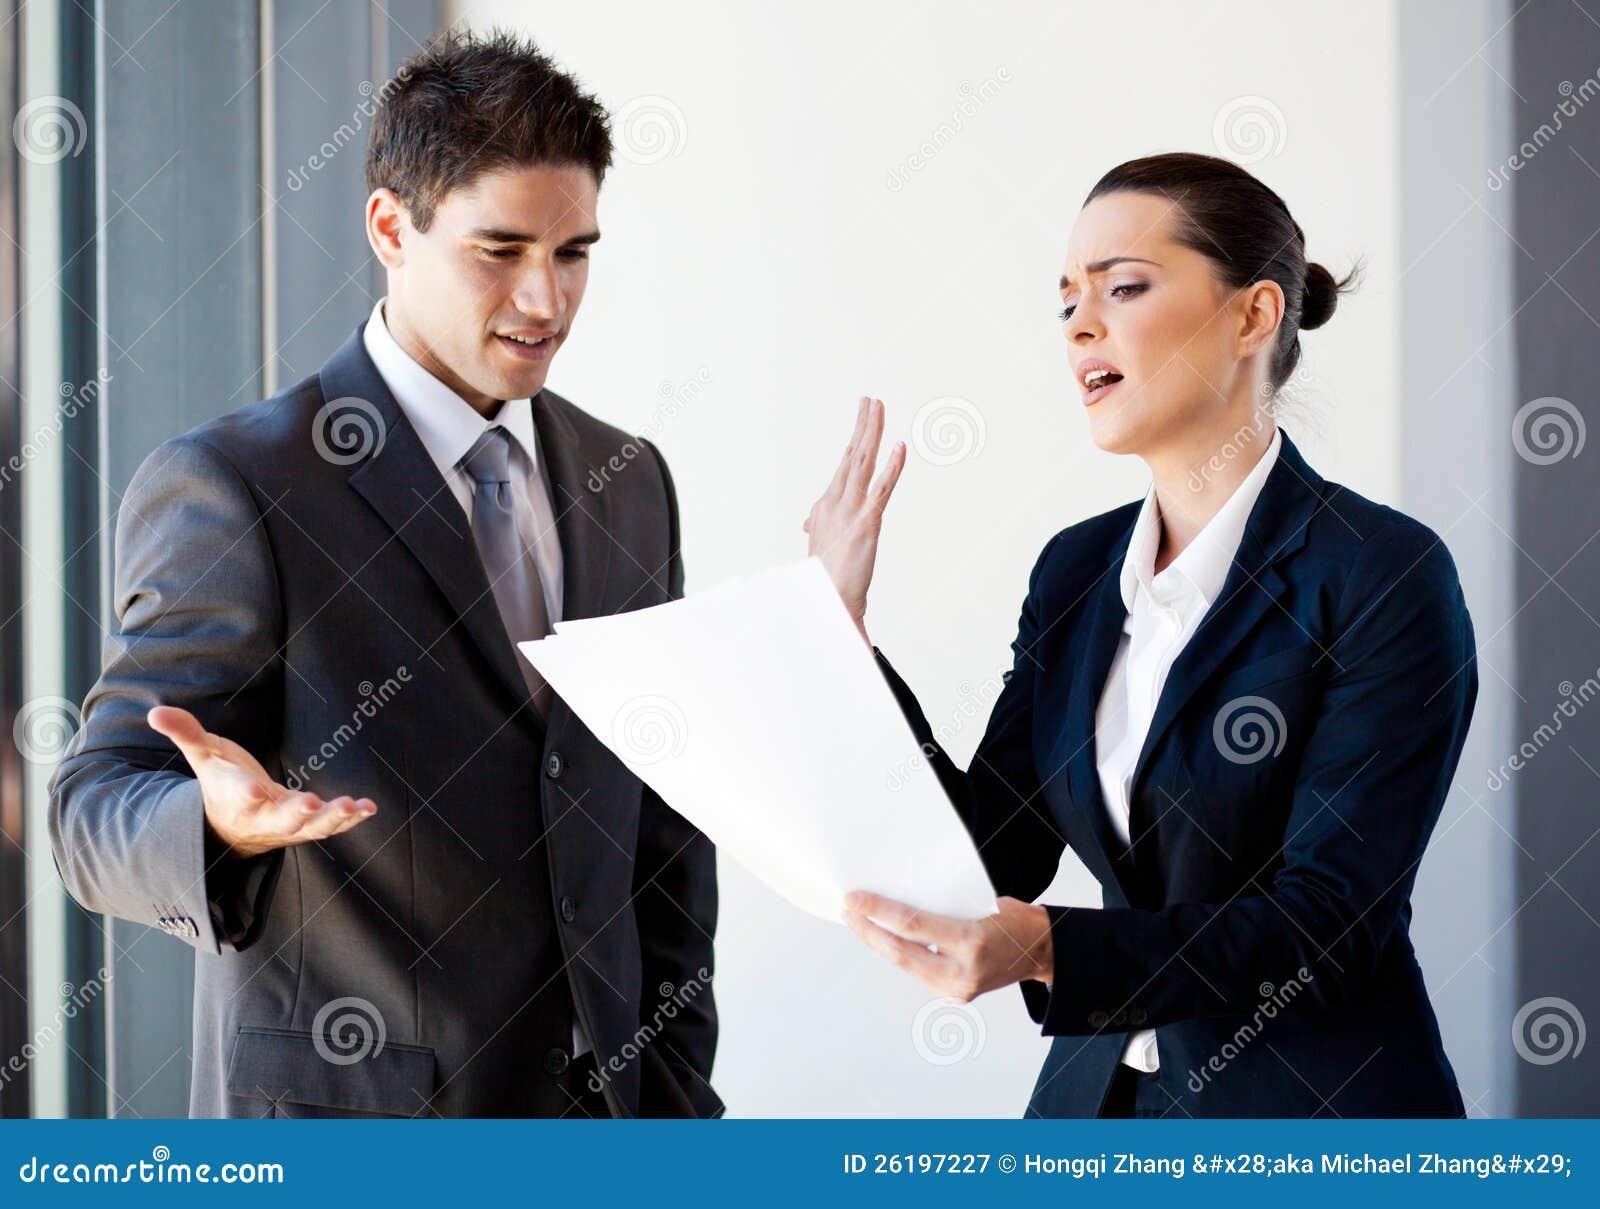 Colleagues arguing